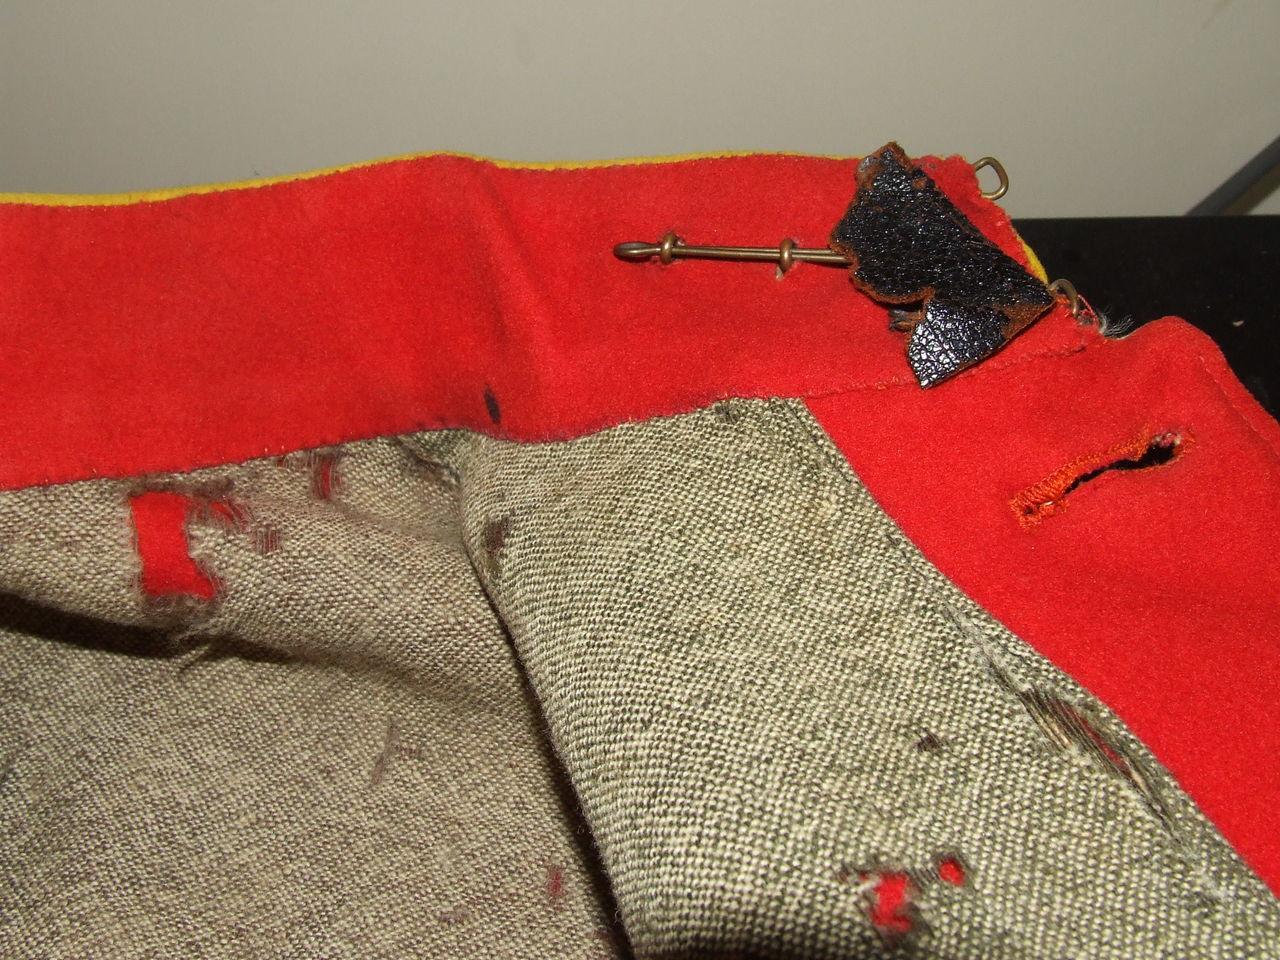 91st Canadian Highlanders Uniform 010